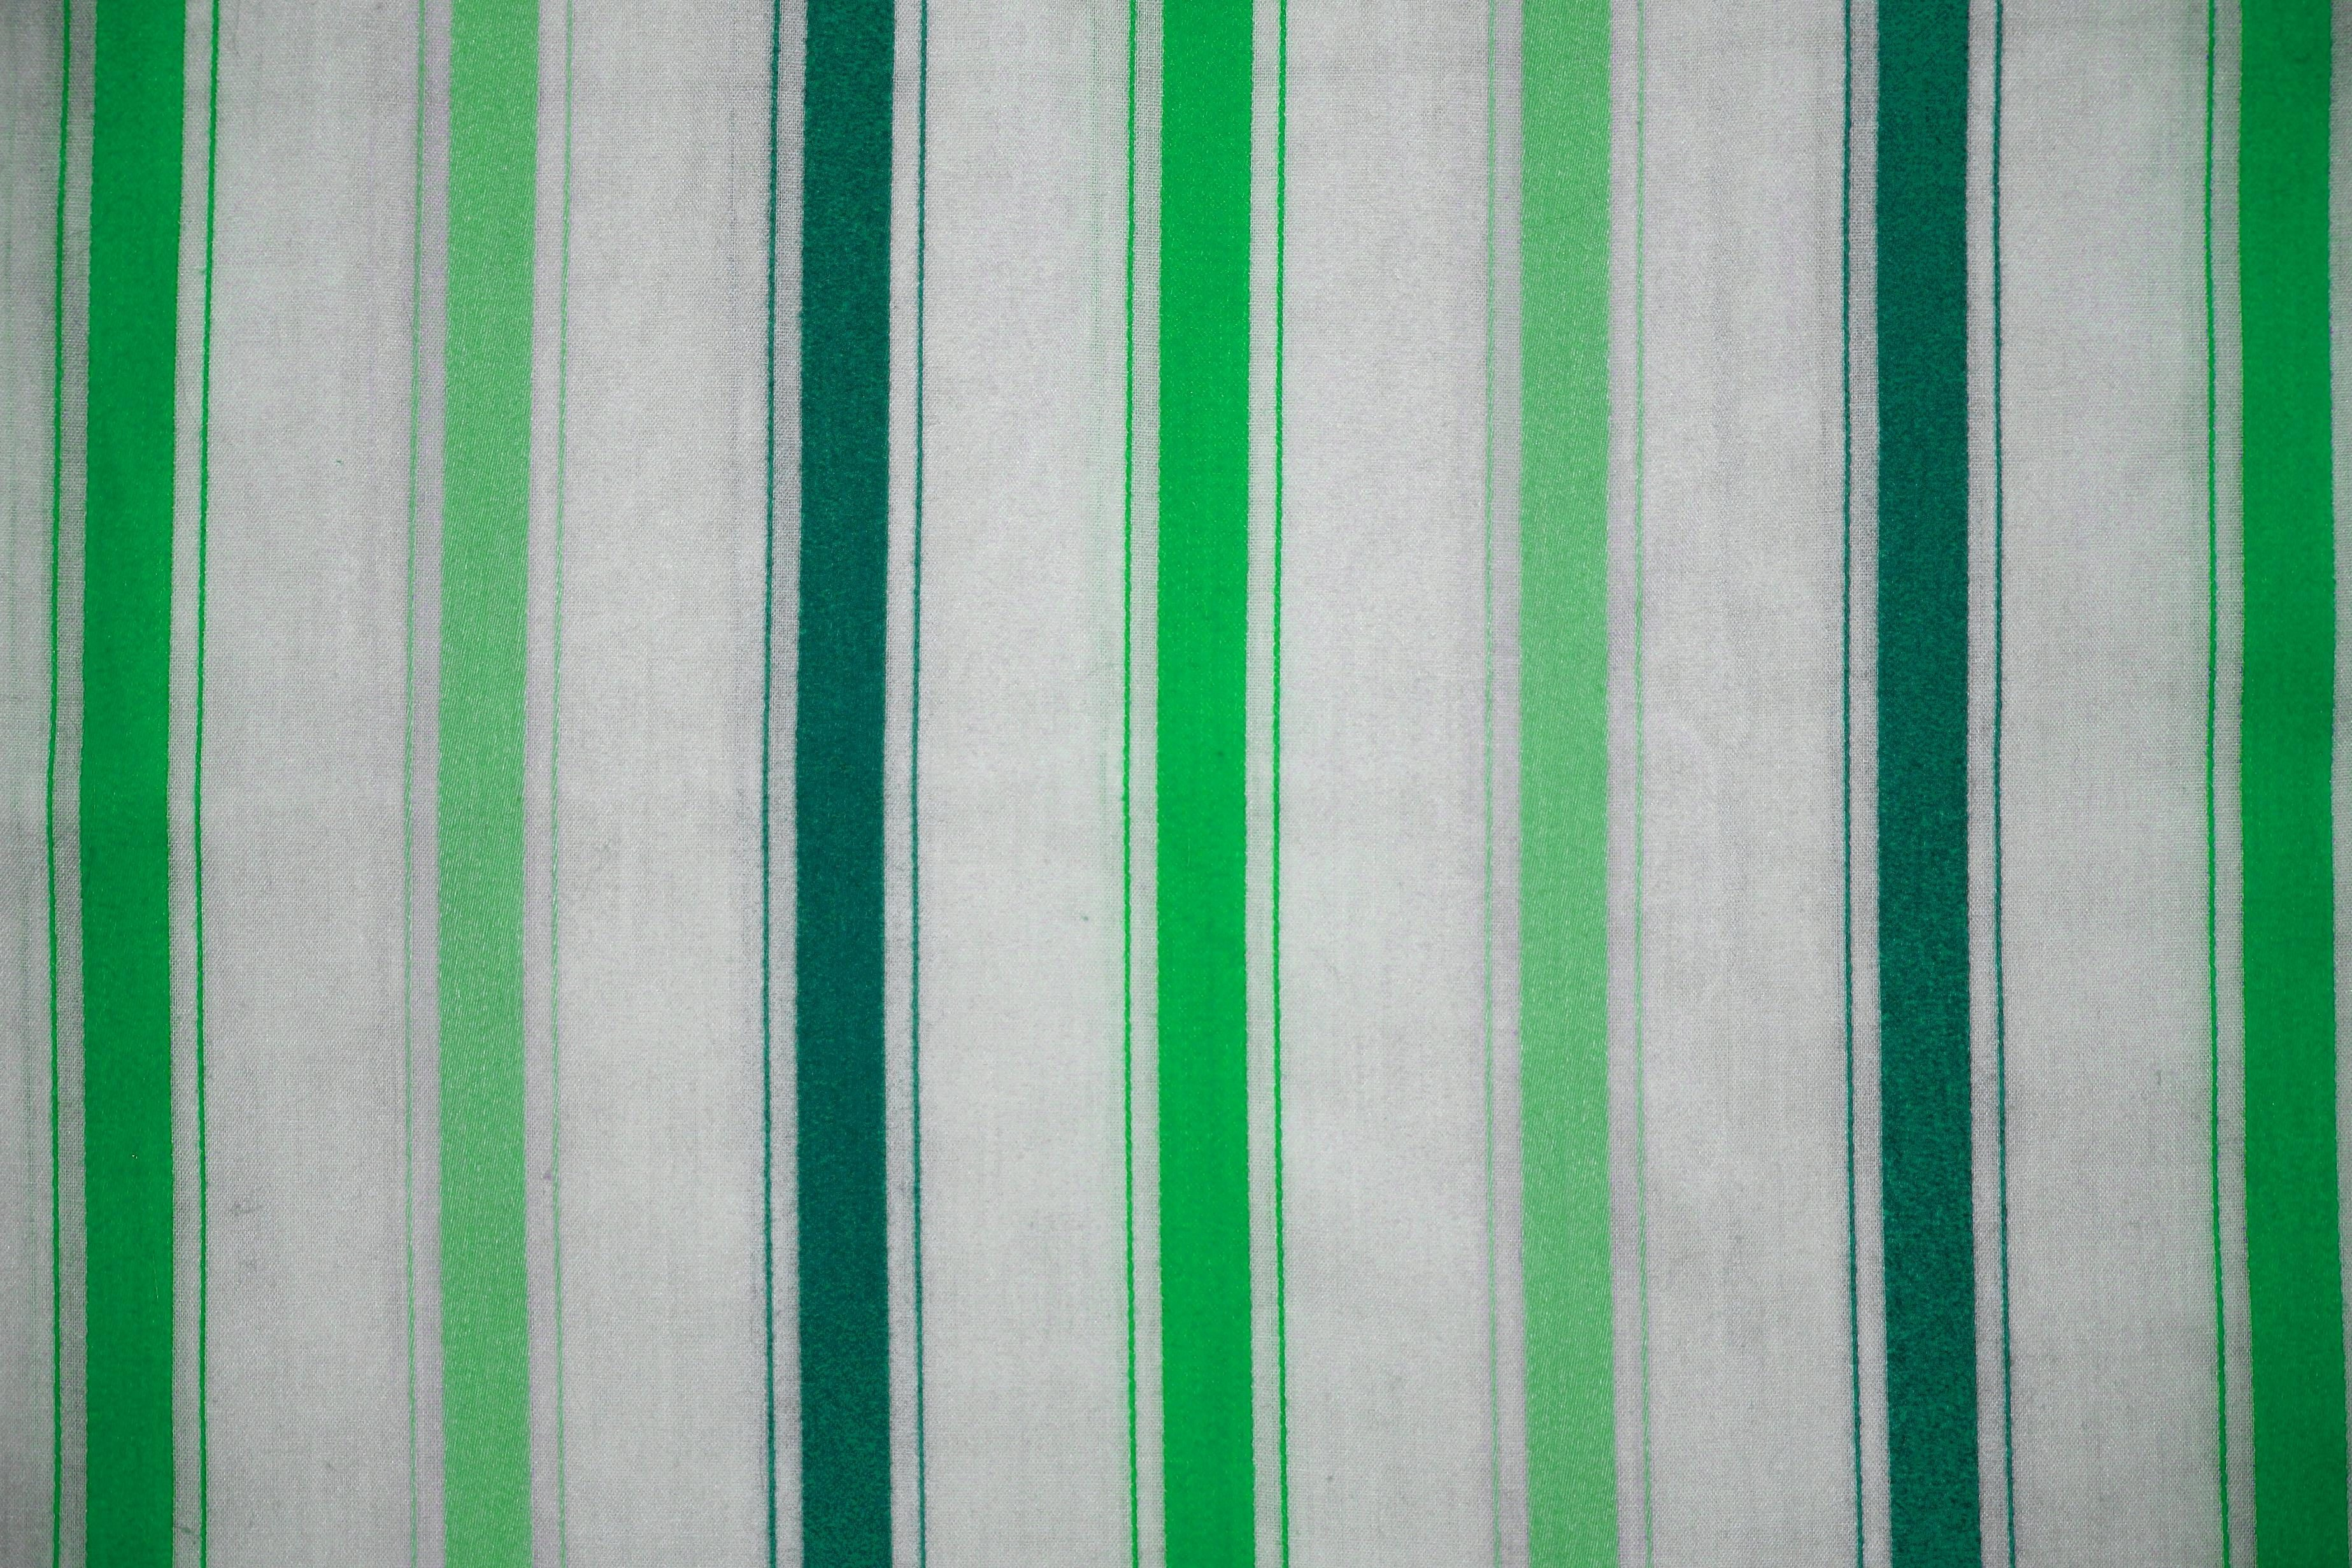 Striped Design Textil Dishcloth Fabric Texture Green White